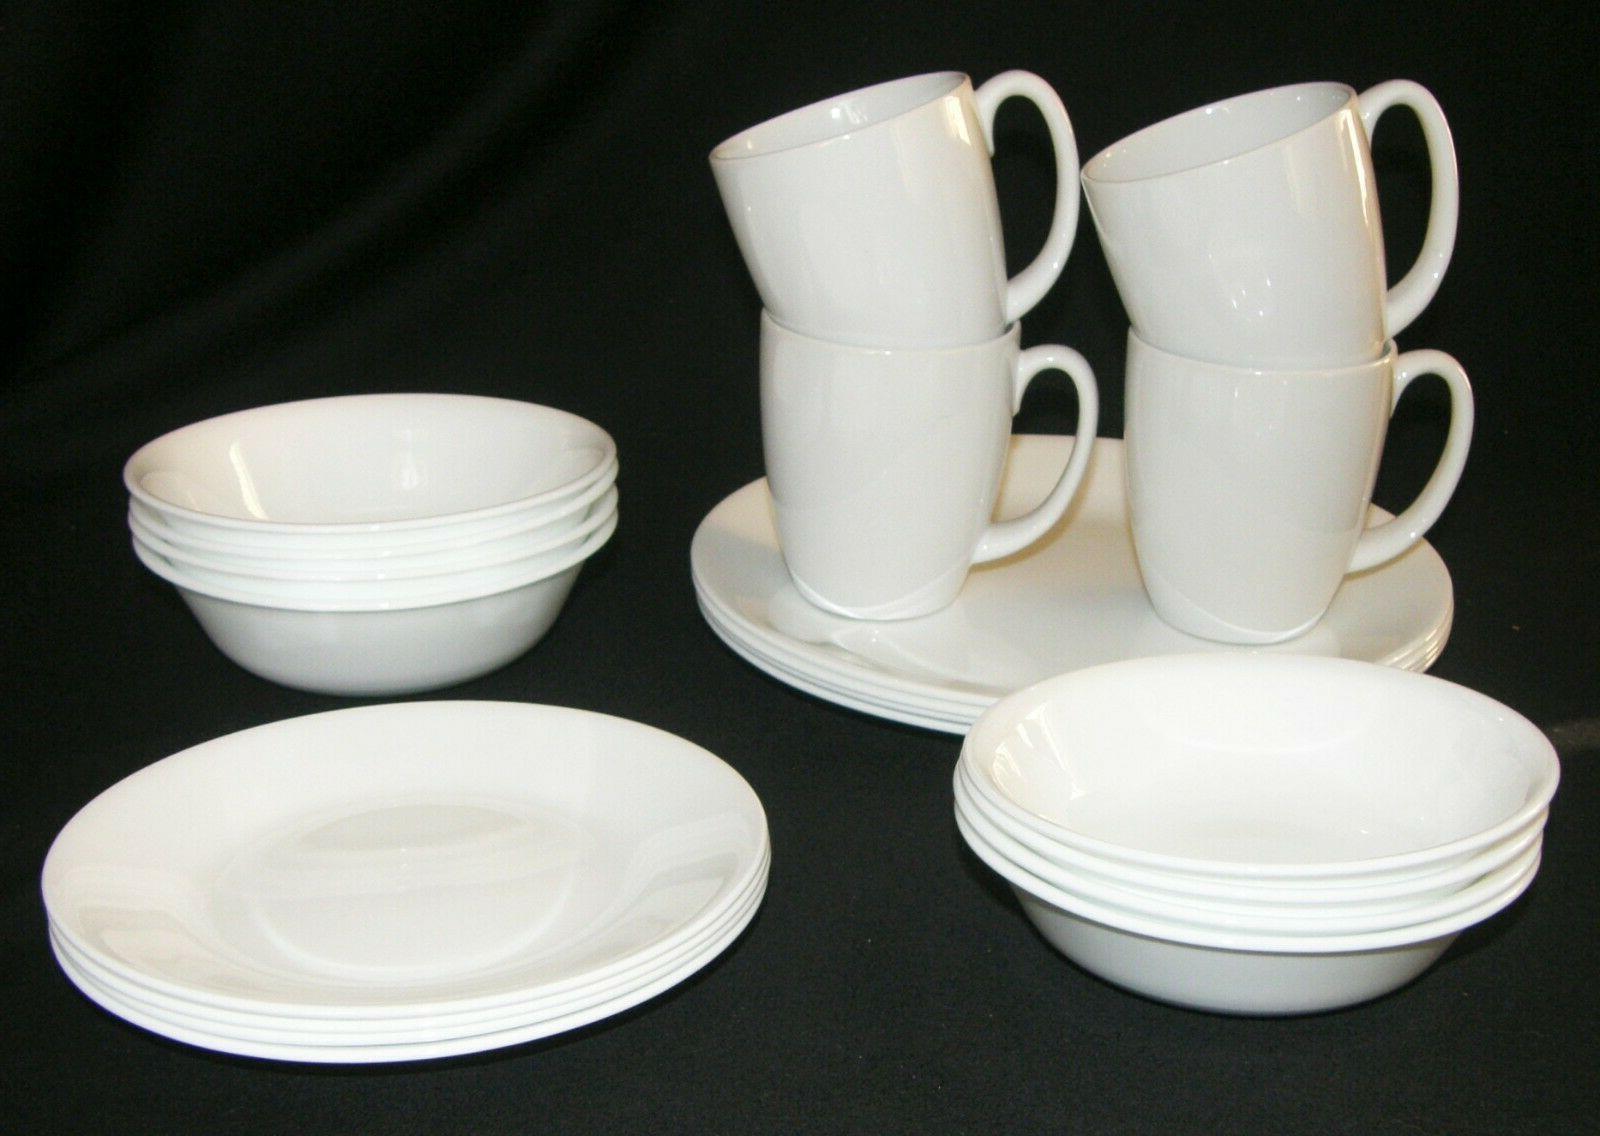 NEW 20 LivingWare Dinnerware Service 4